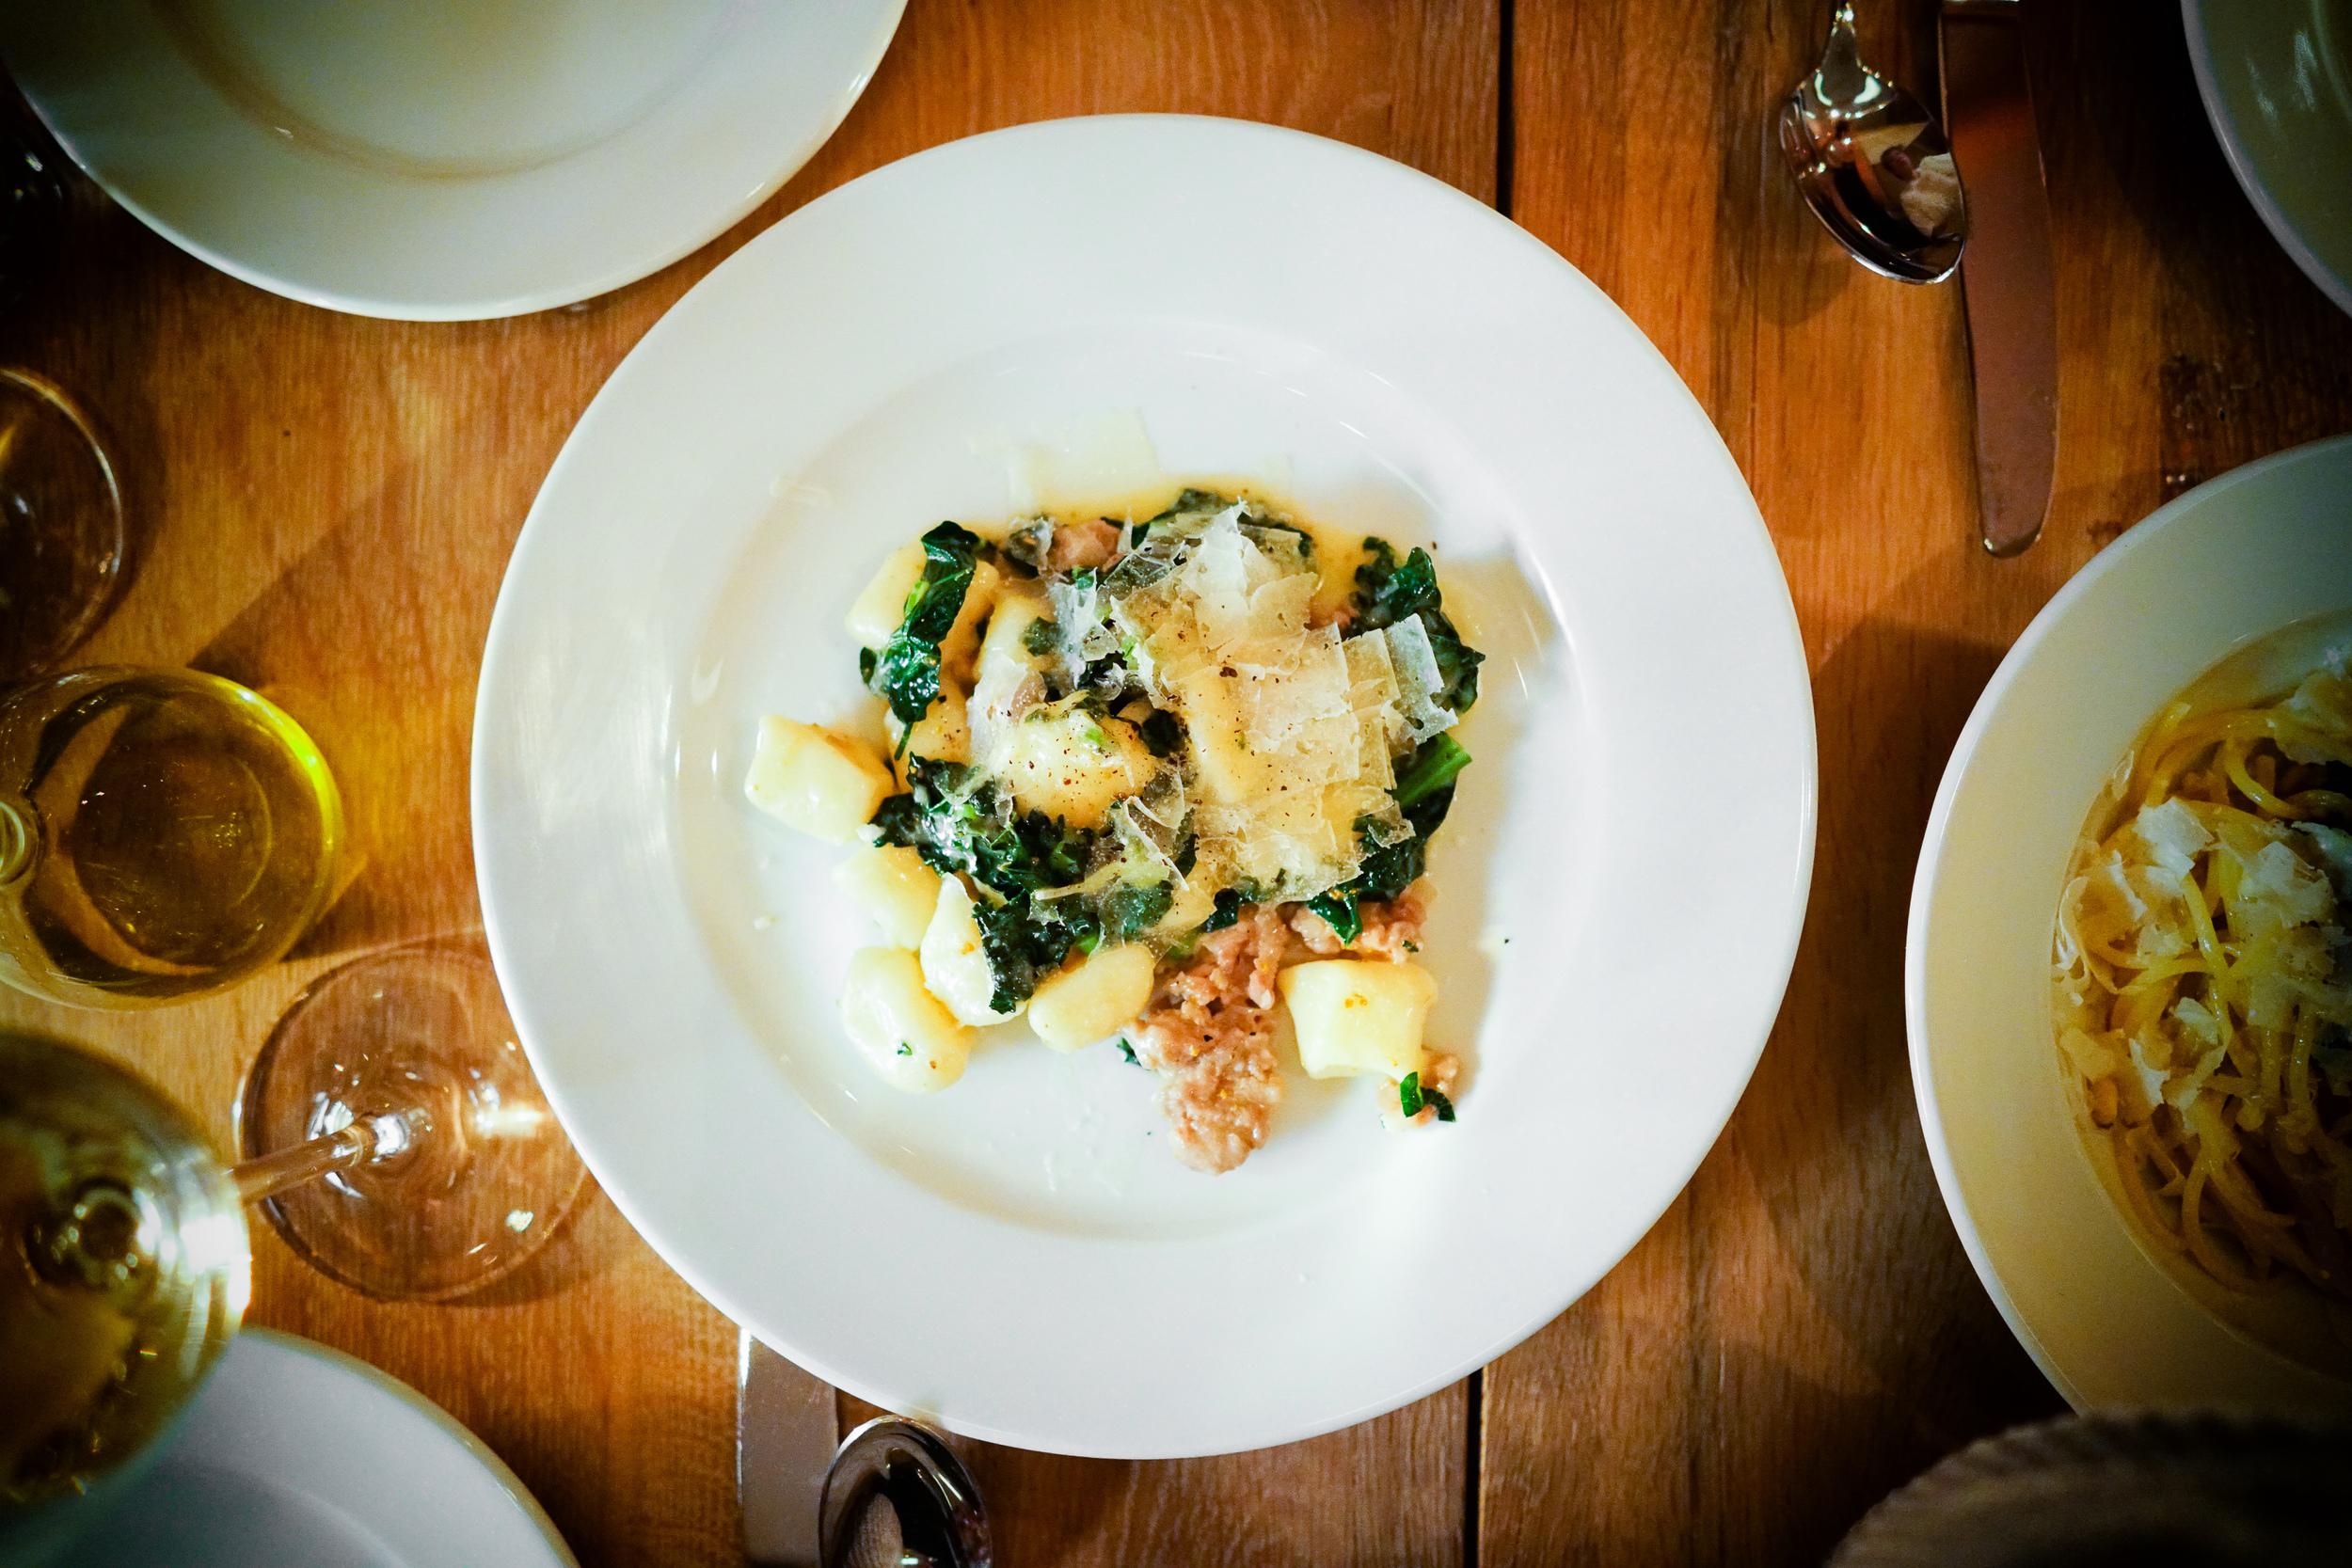 Mezzaluna di ricotta with asparagus and nettles ($22)